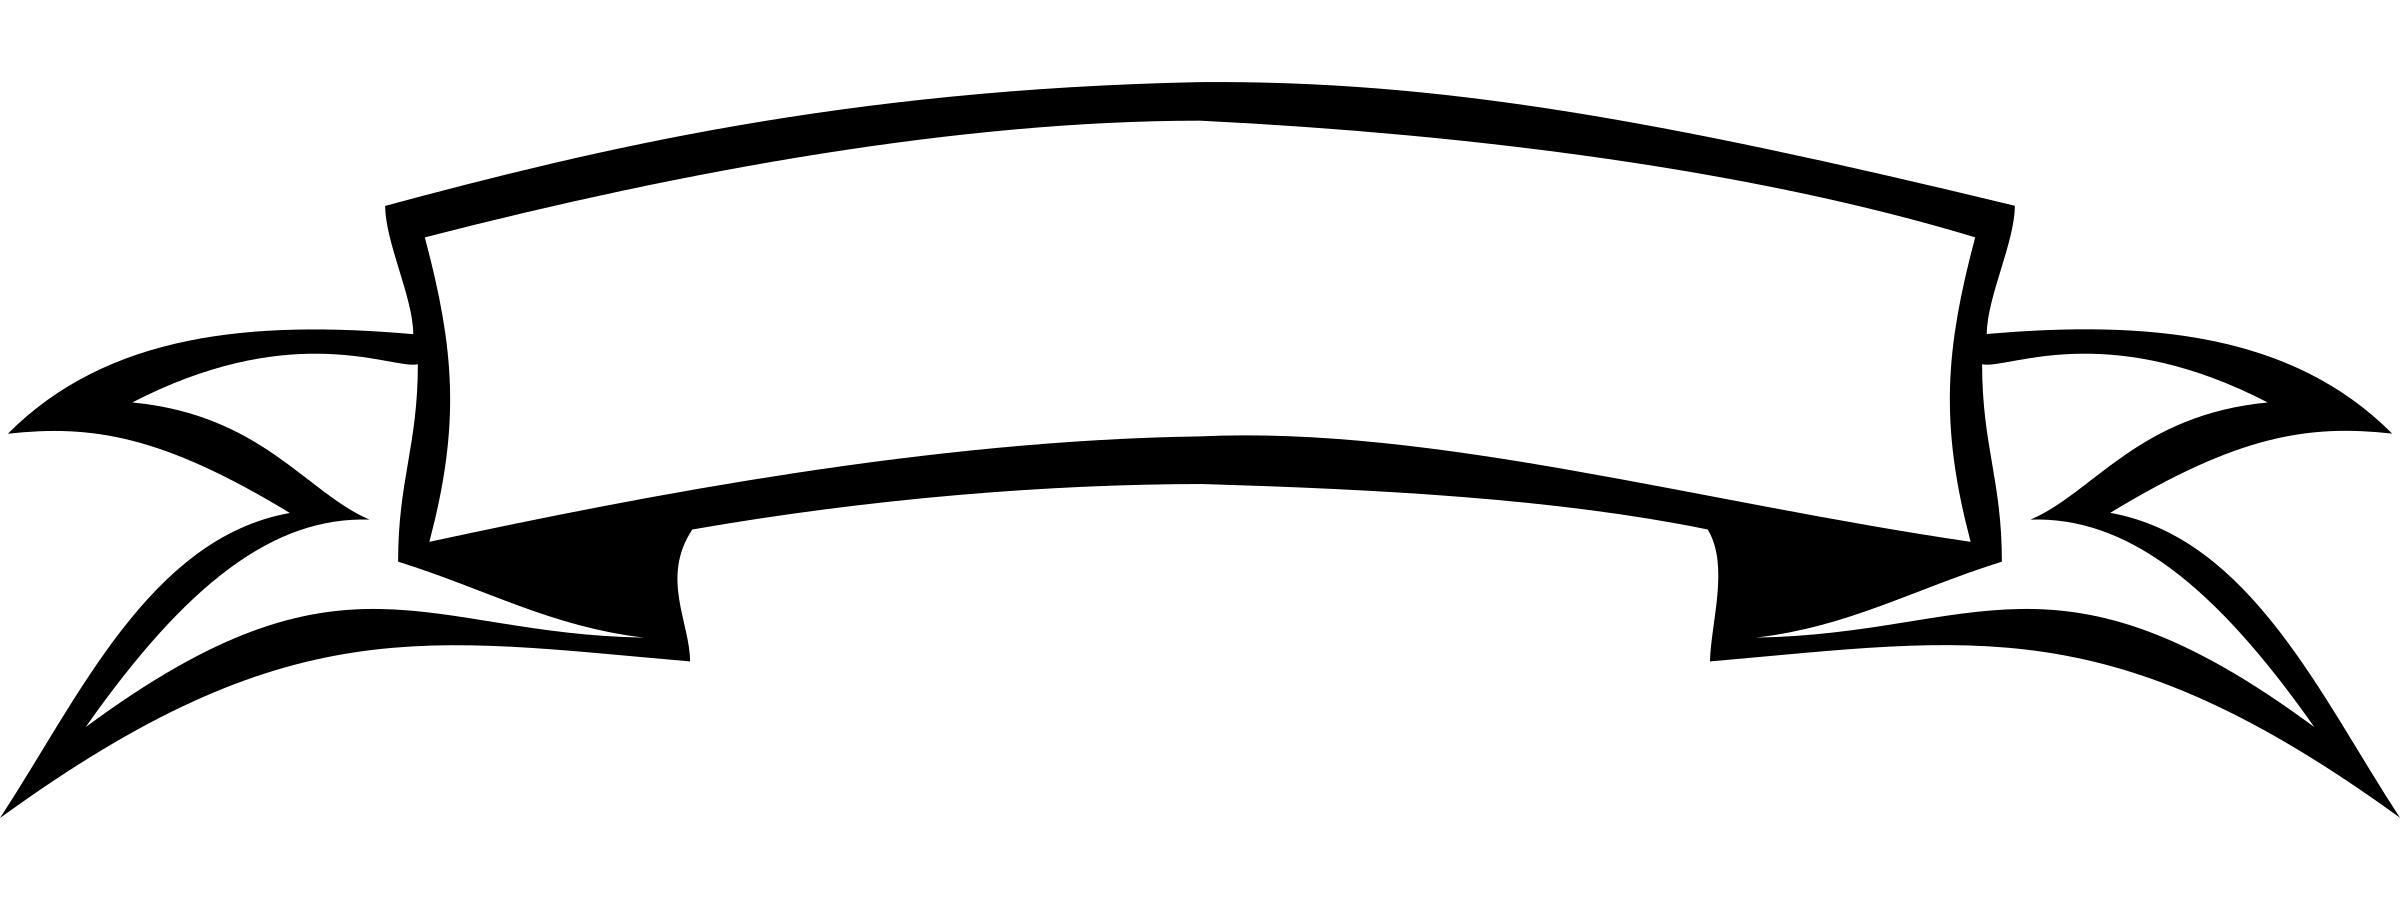 Clipart banner vector, Clipart banner vector Transparent